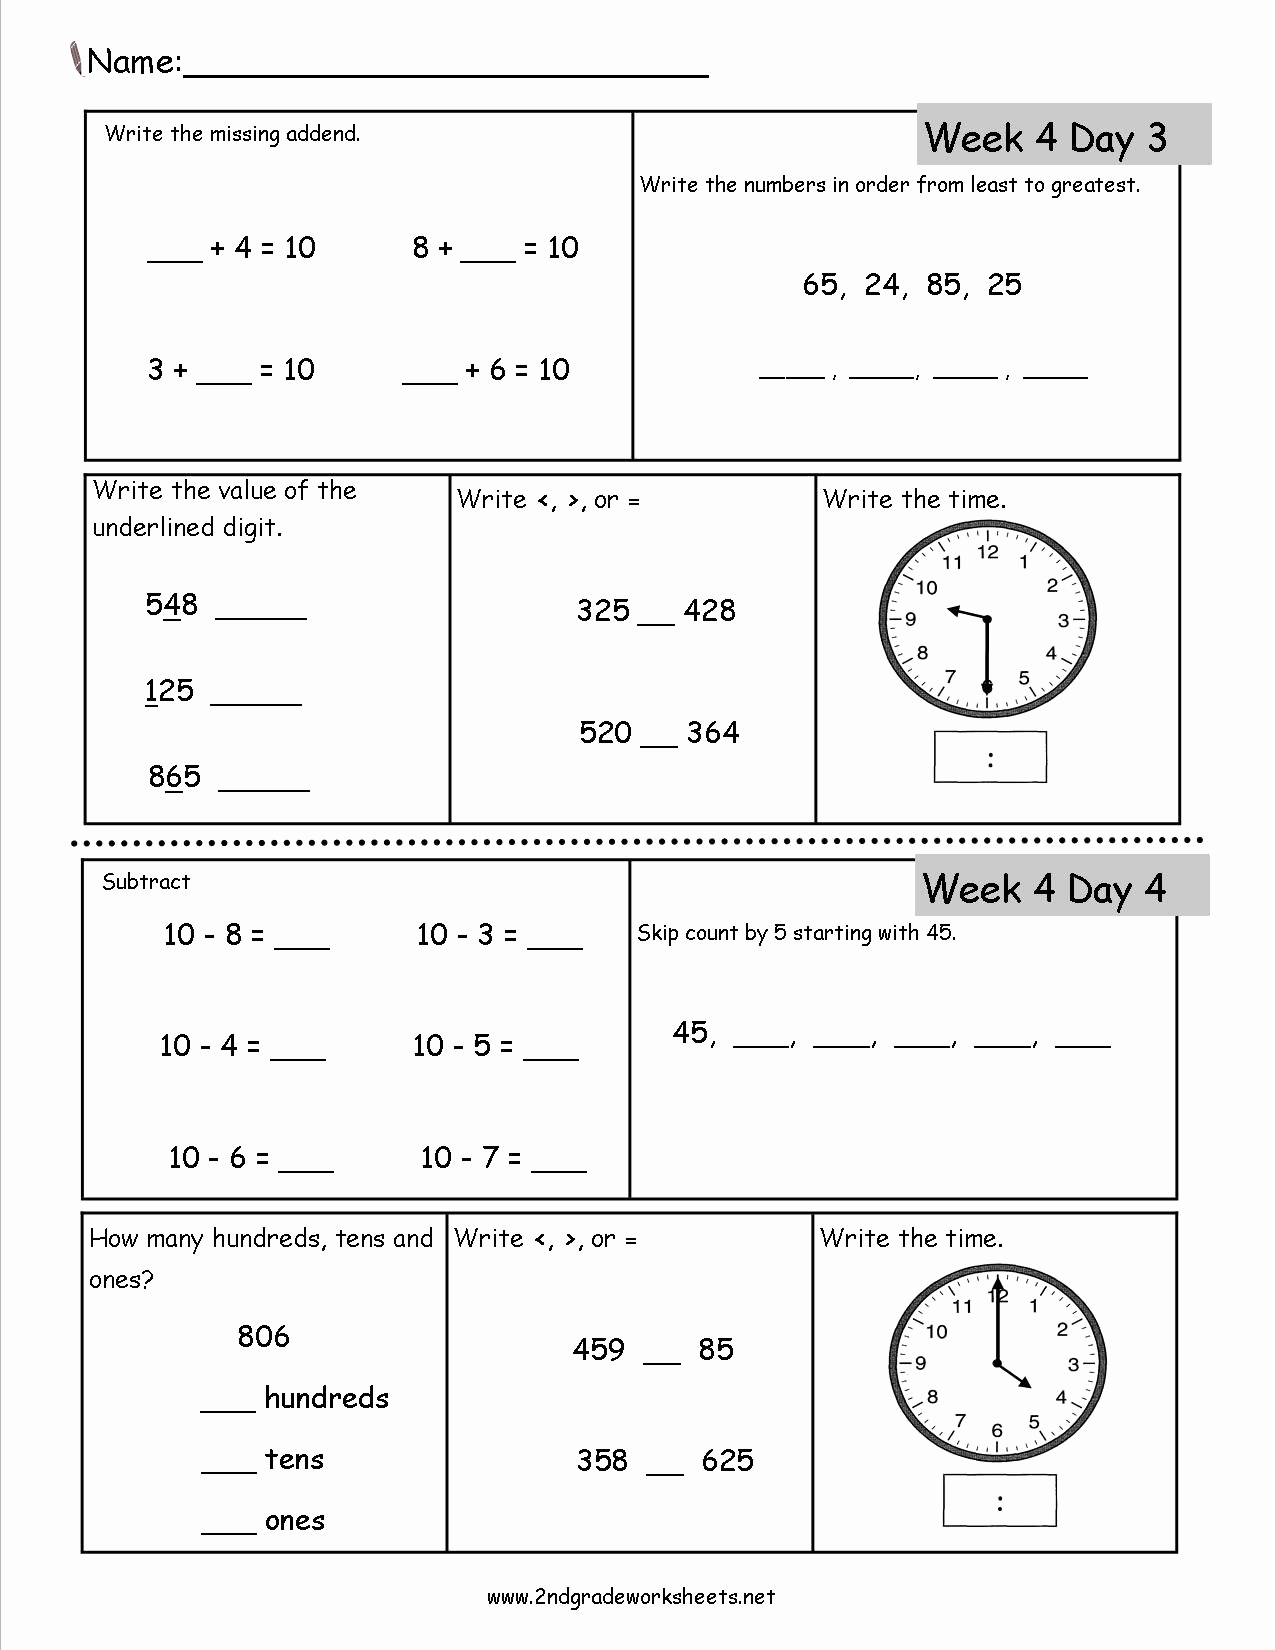 Nwea Math Practice Worksheets Inspirational 20 Nwea Math Practice Worksheets Dzofar Printable Worksheets